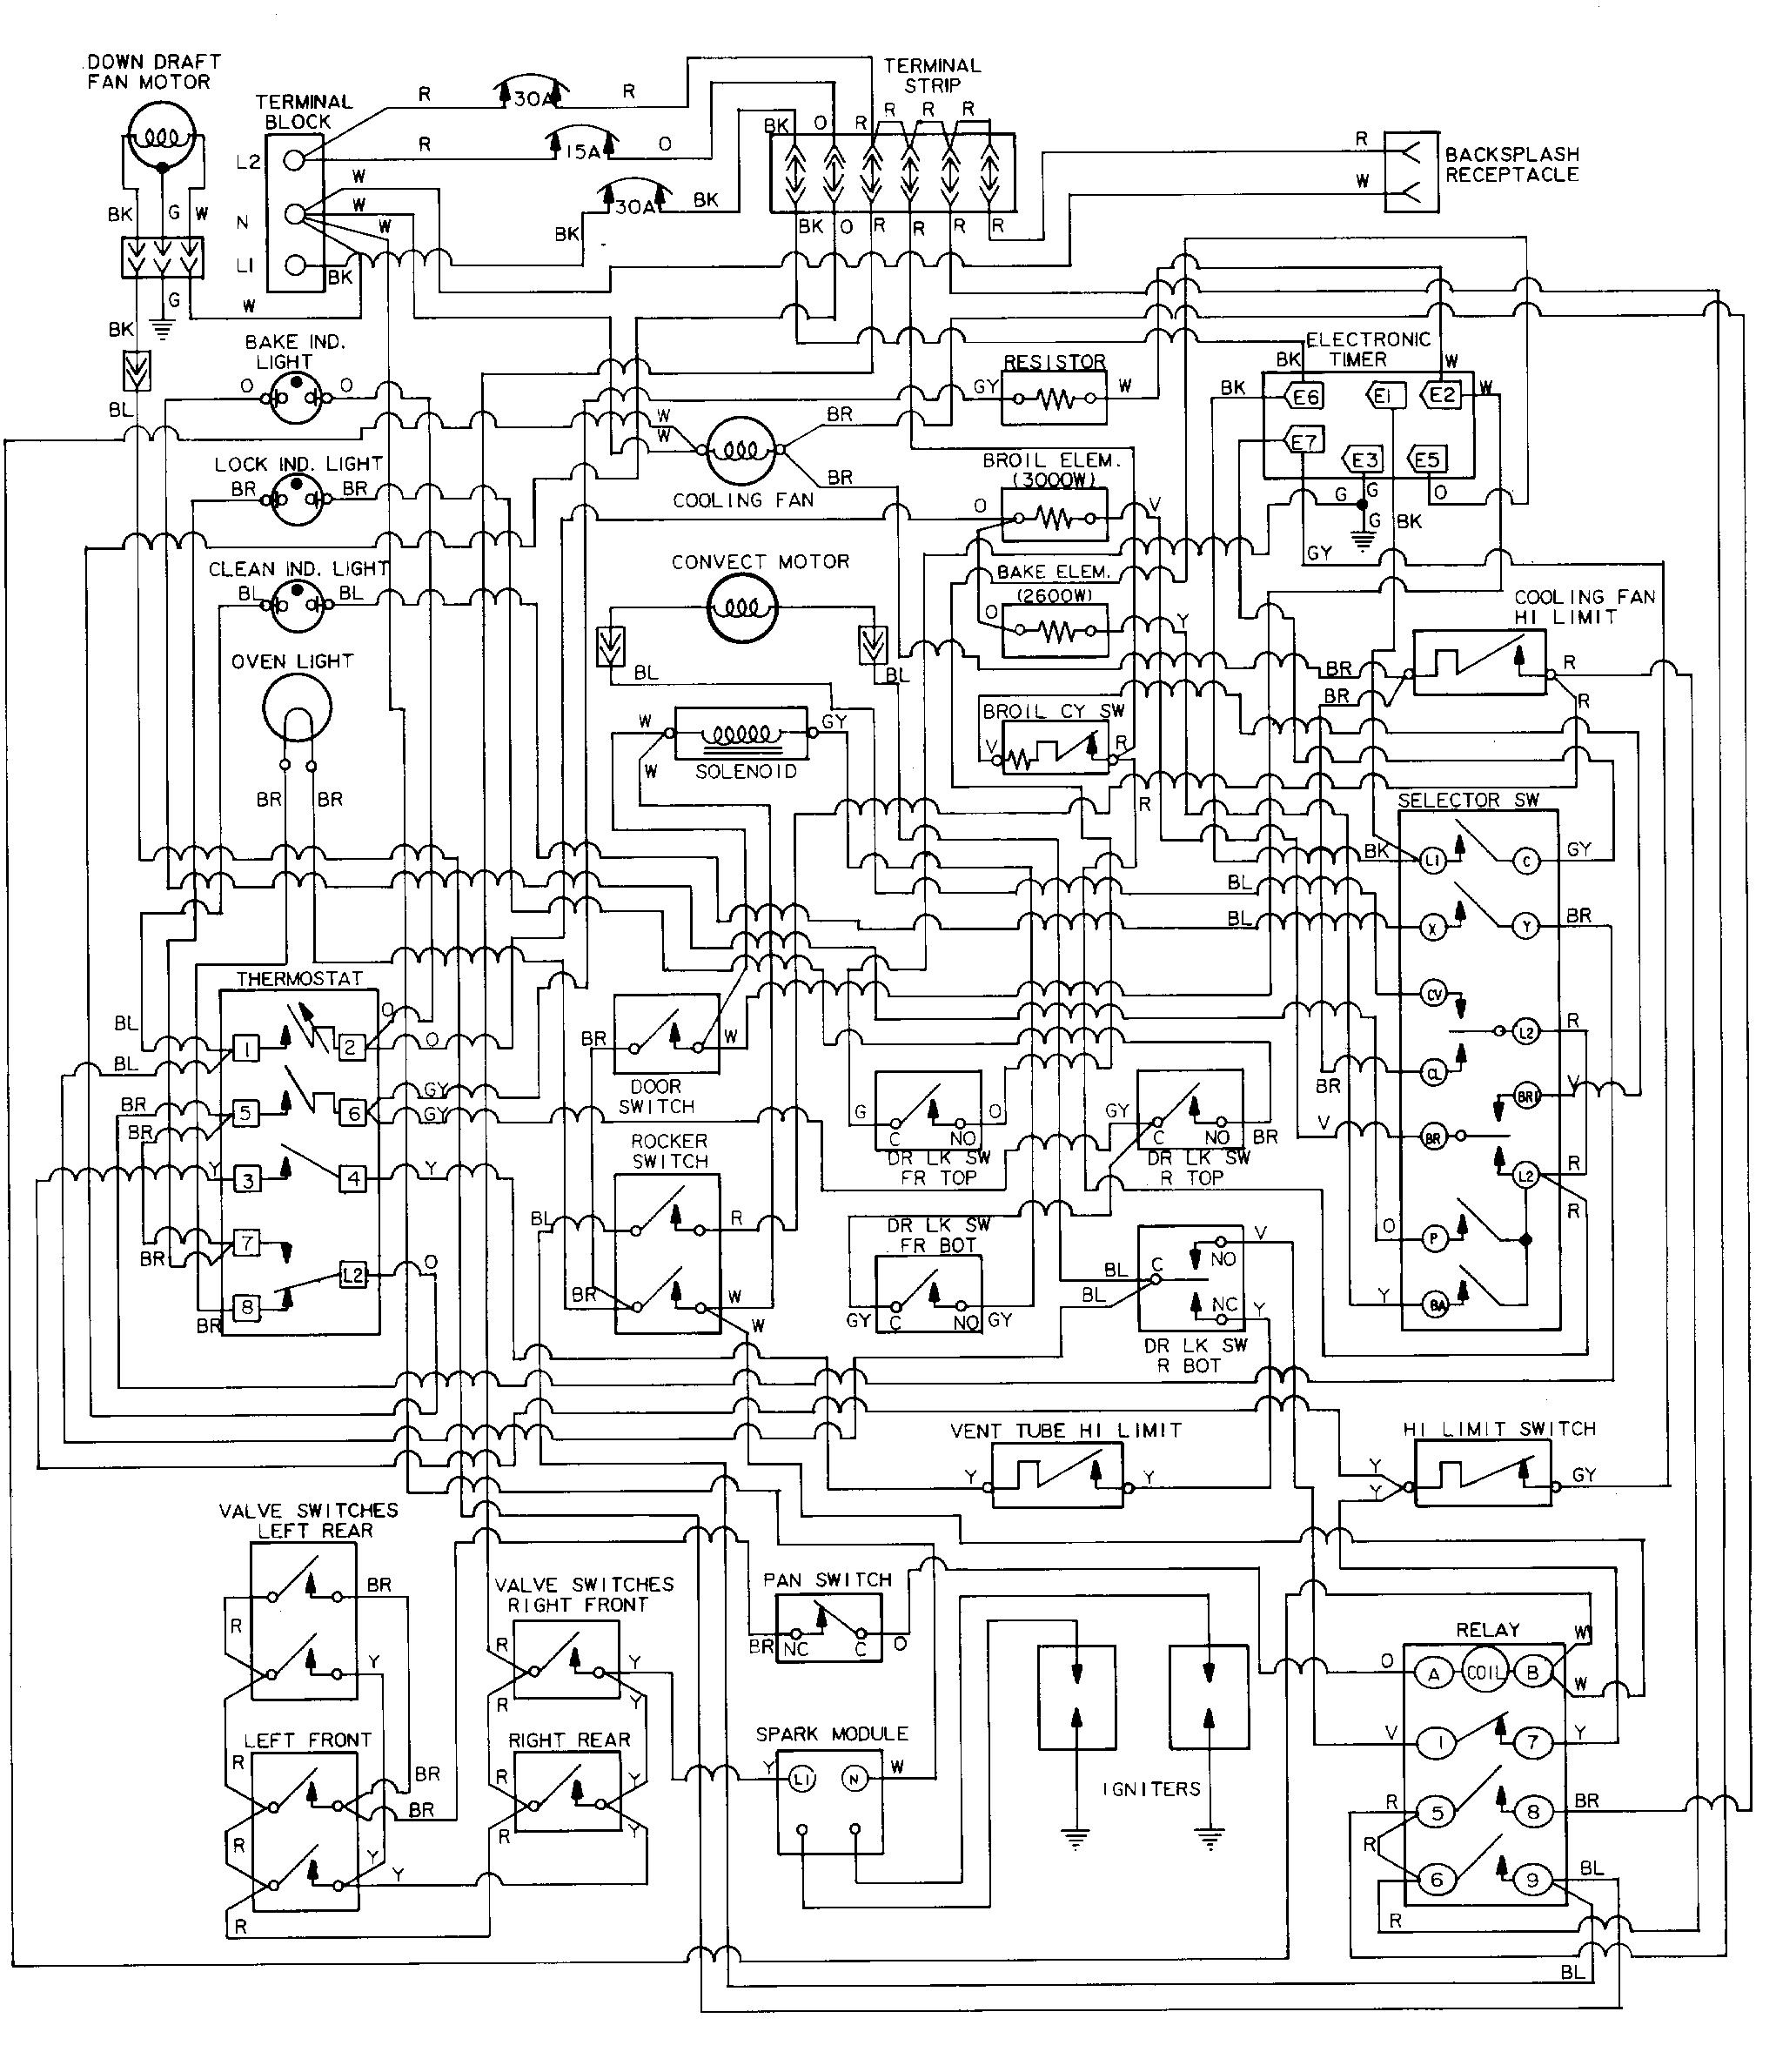 Ducane Heat Pump Wiring Diagram : 31 Wiring Diagram Images - Wiring Diagrams  | Edmiracle.